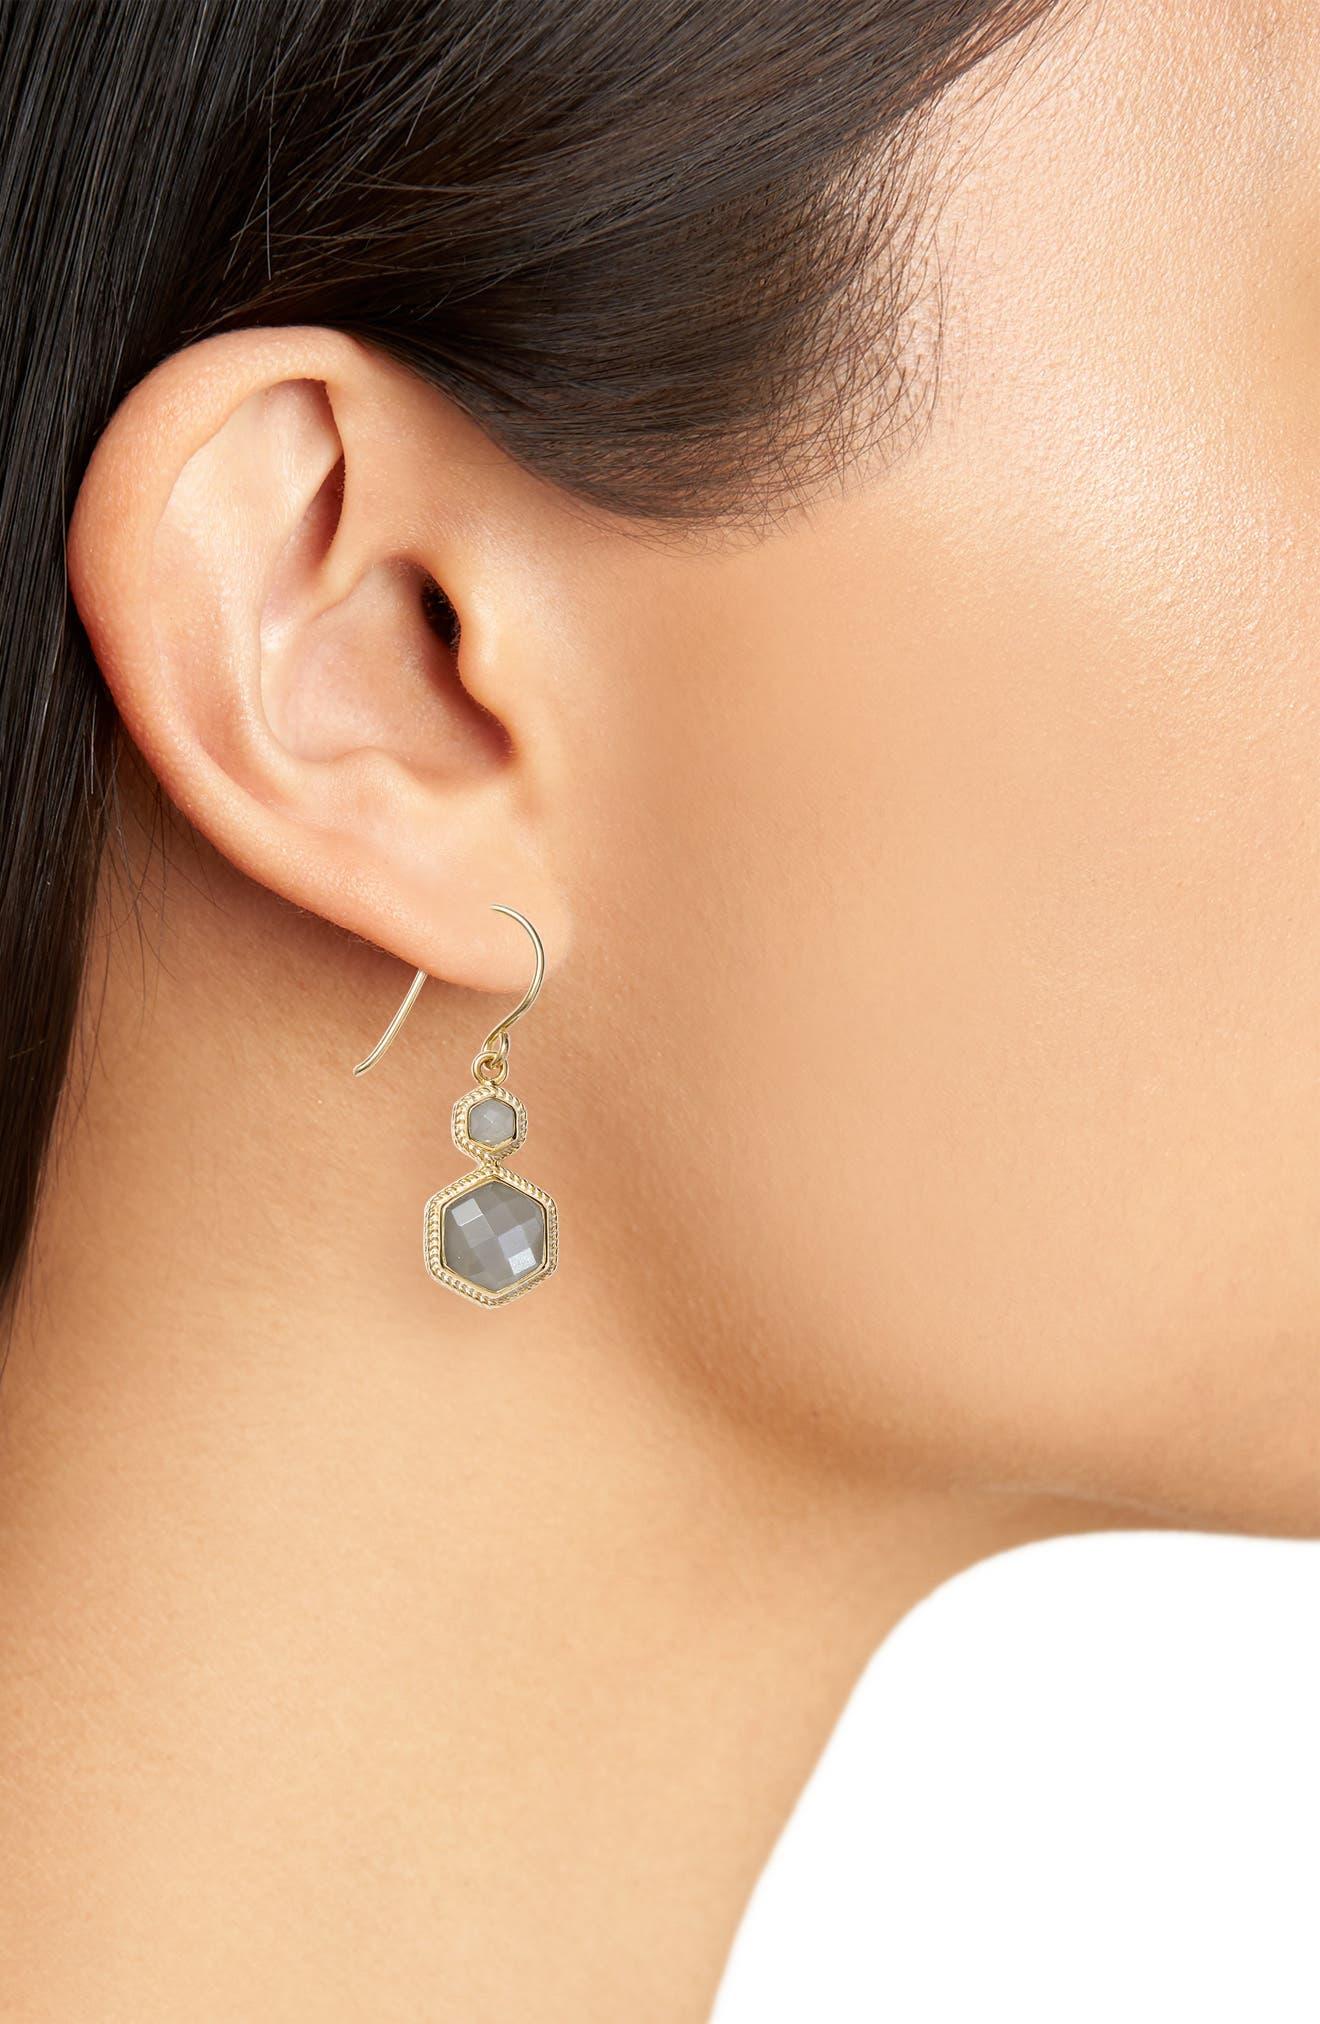 Grey Moonstone Double Drop Earrings,                             Alternate thumbnail 2, color,